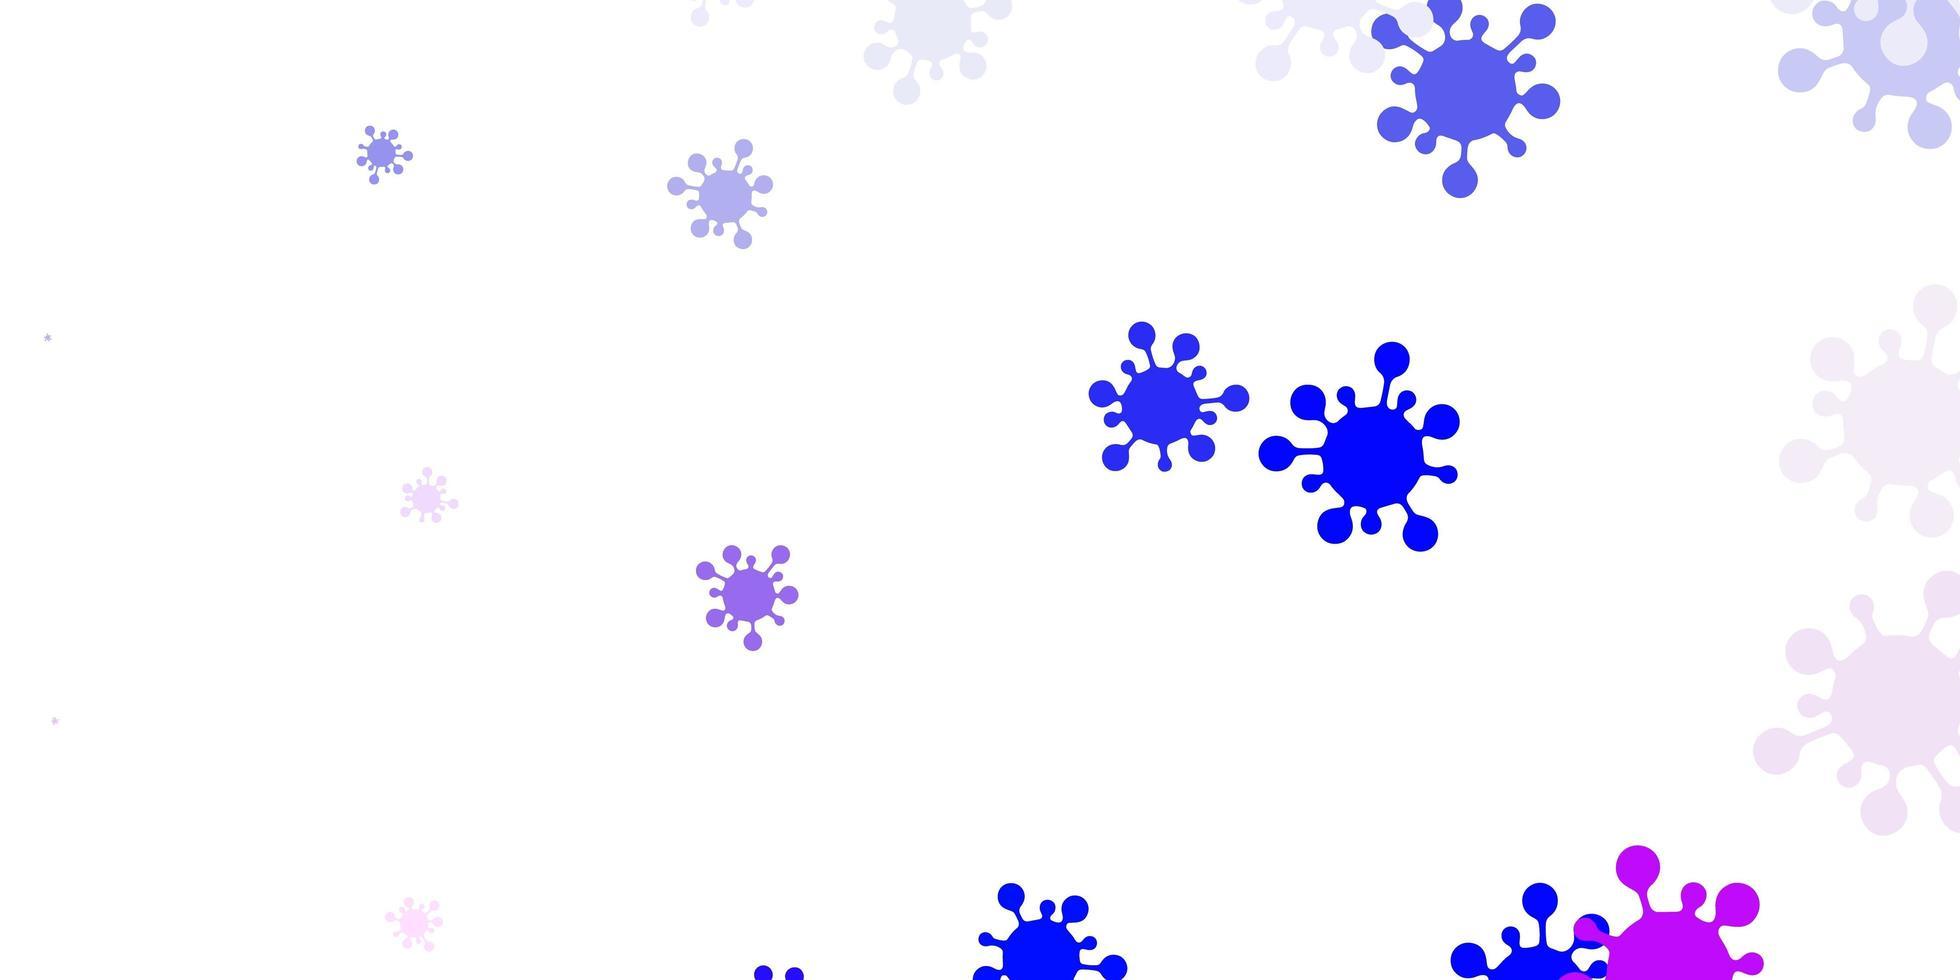 texture de vecteur rose clair, bleu avec symboles de maladie